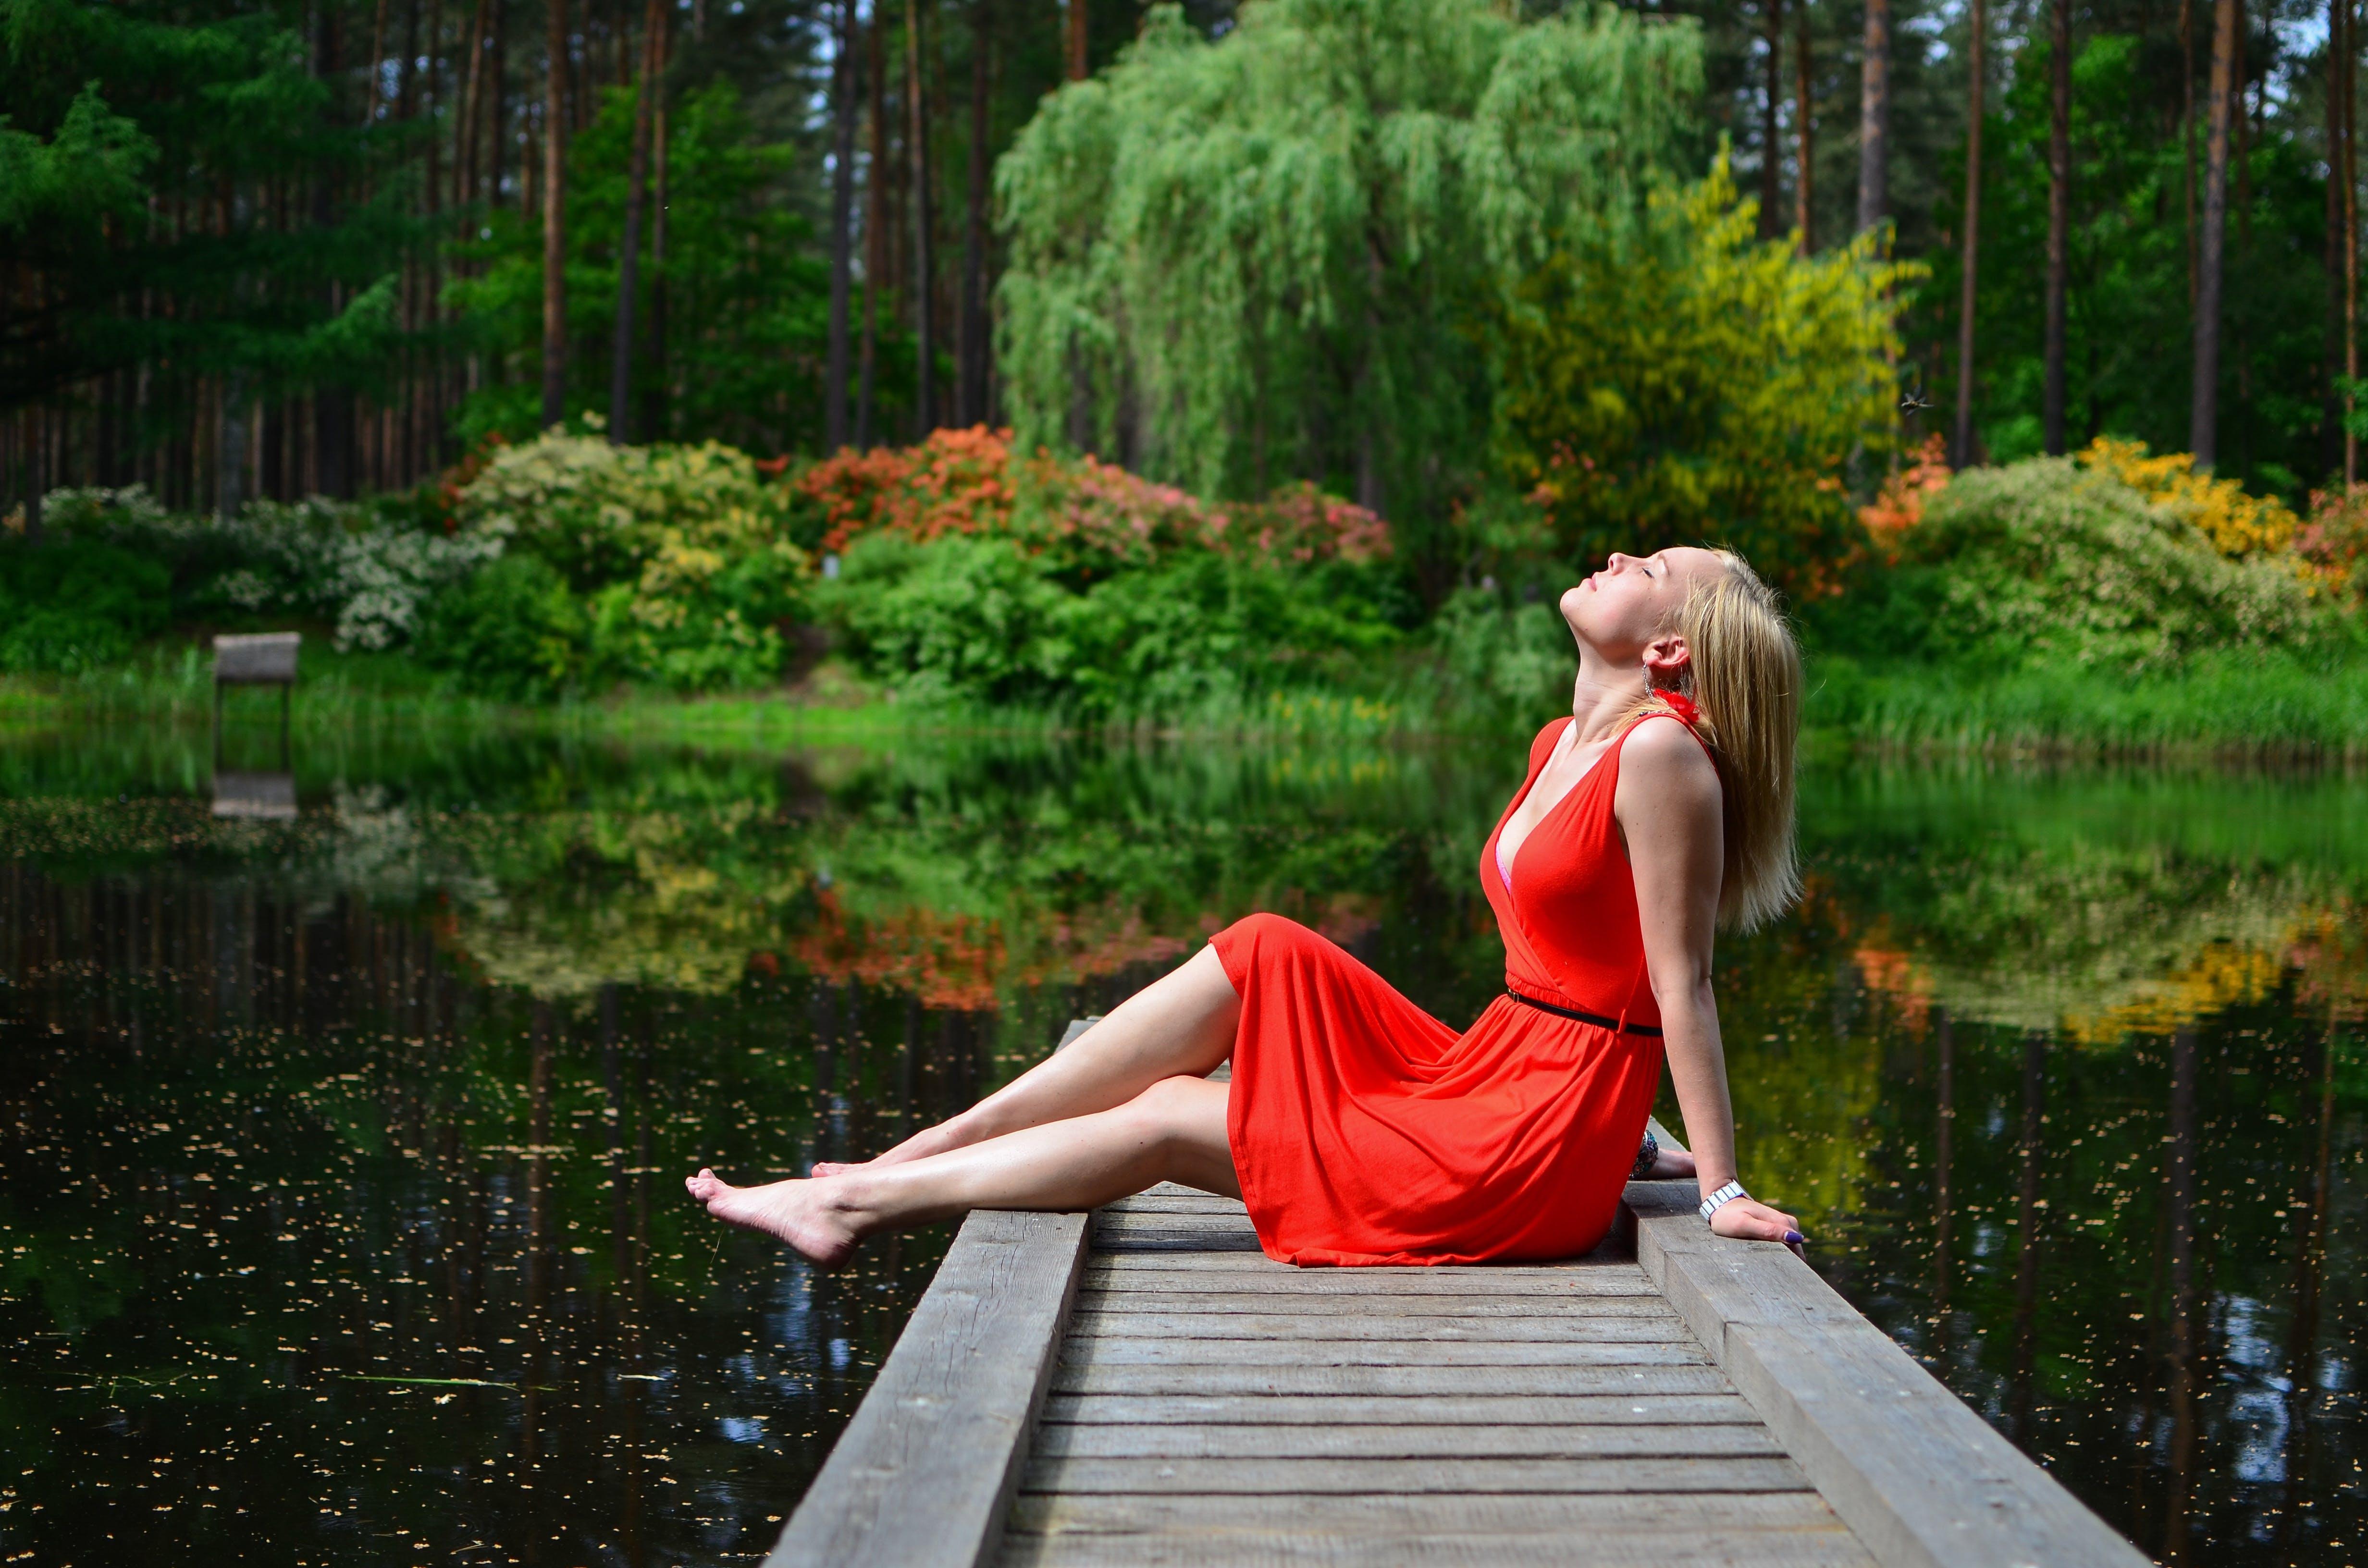 Woman Sitting on Gray Dock